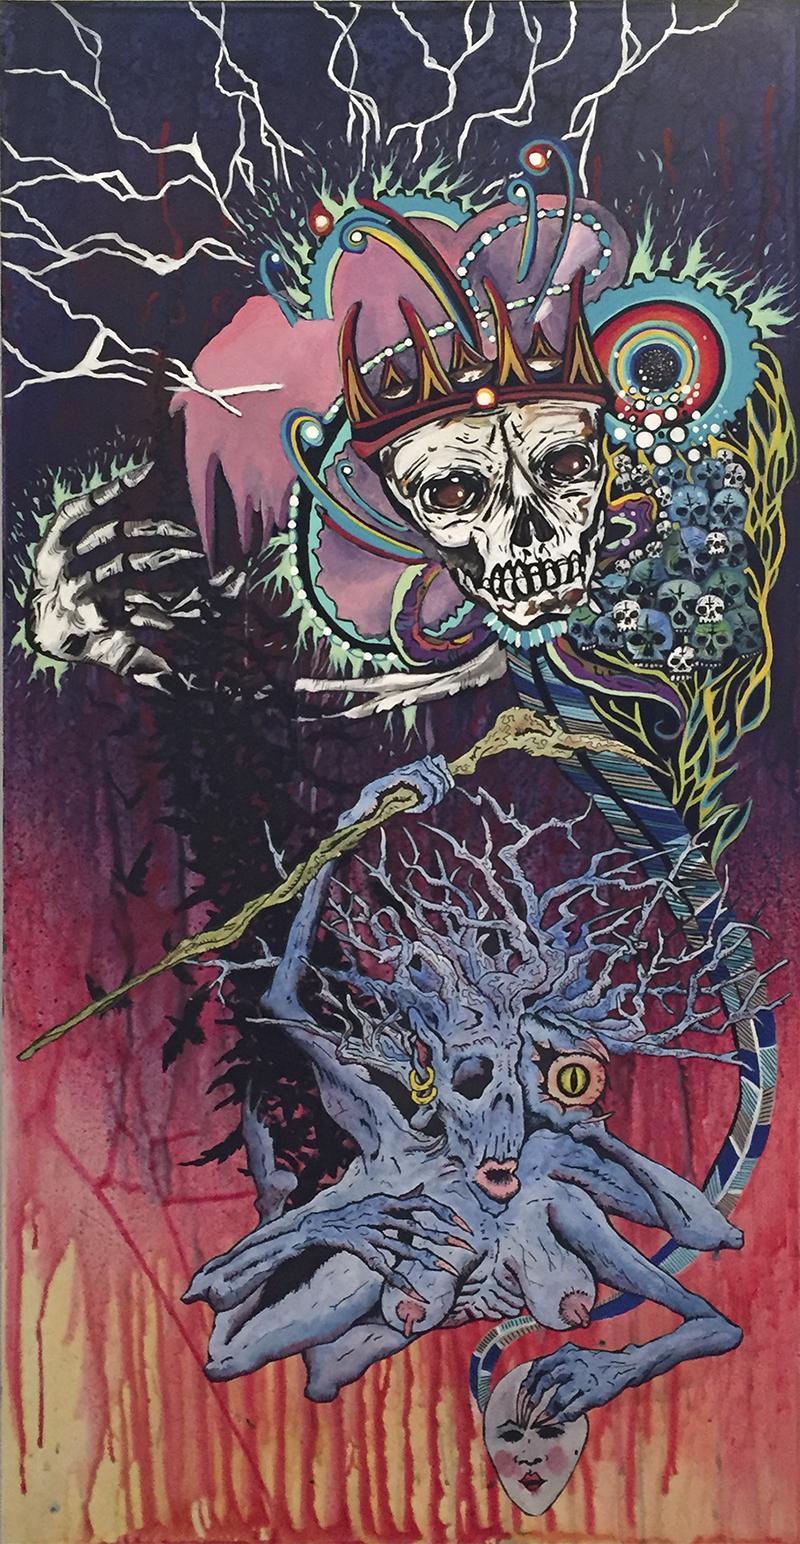 You Worship Your Own Demise - w/Jason Krekel - $700